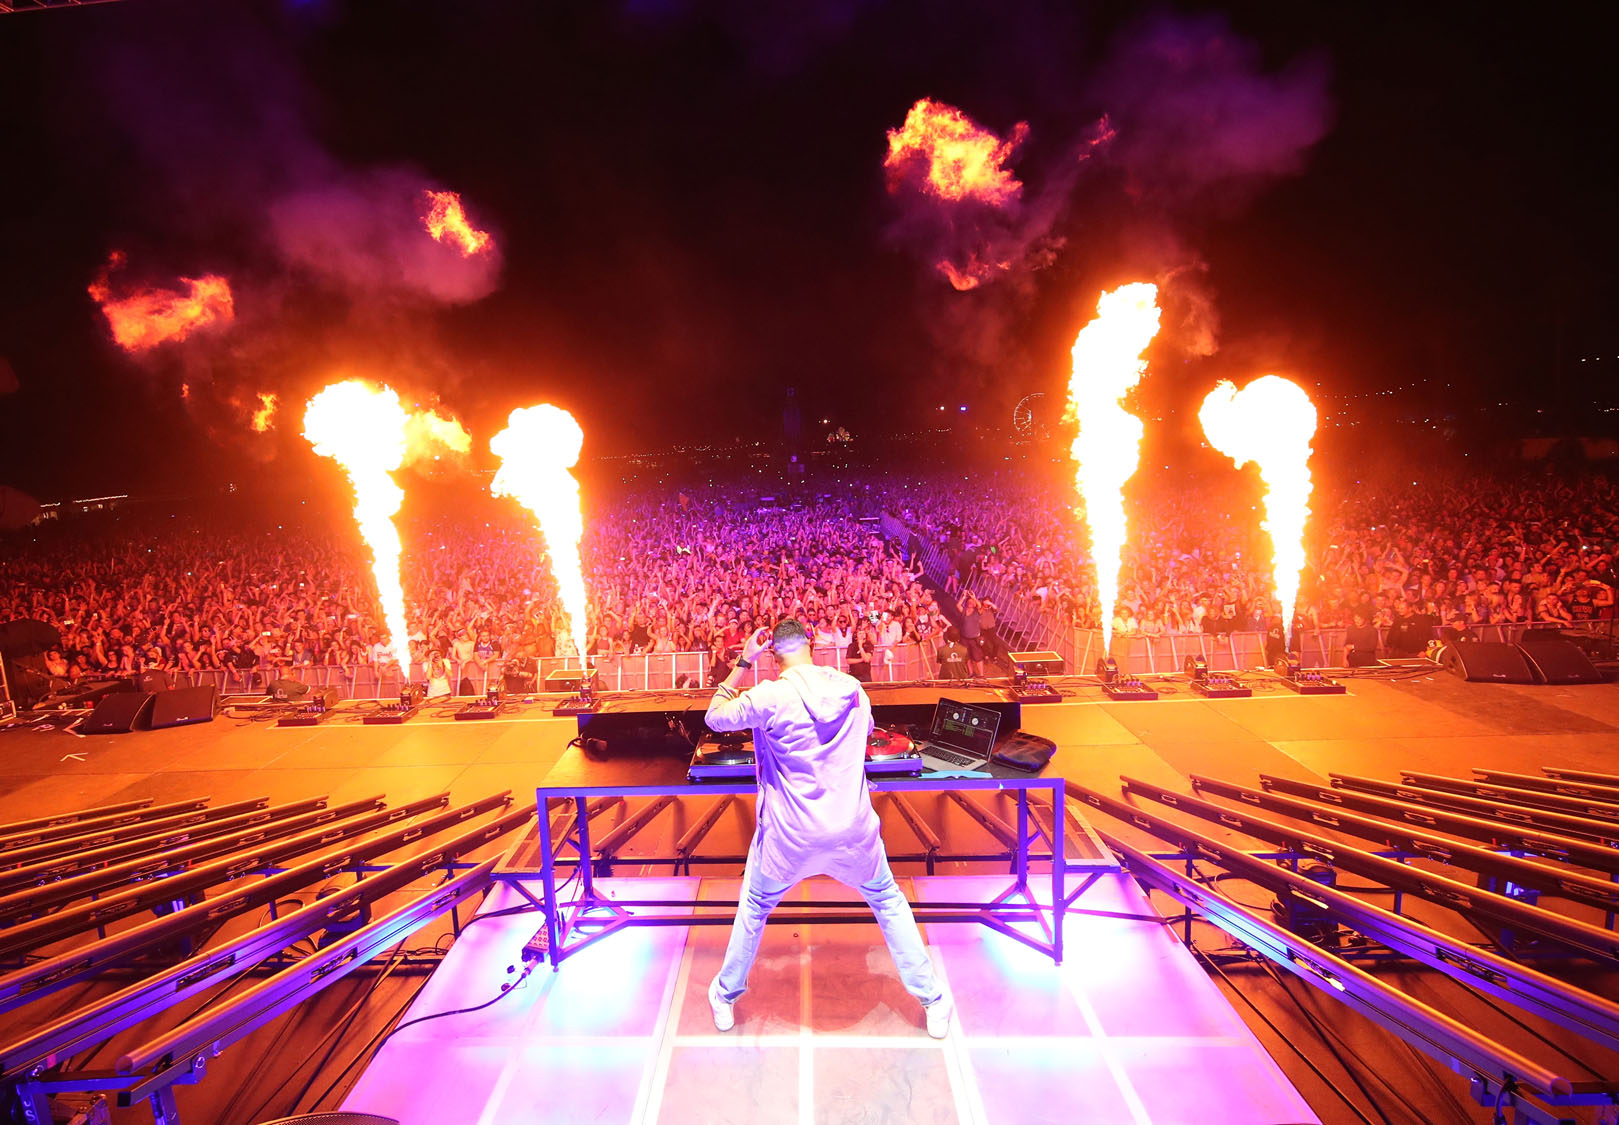 2018 Coachella Music Festival Latest News, Photos, and Videos